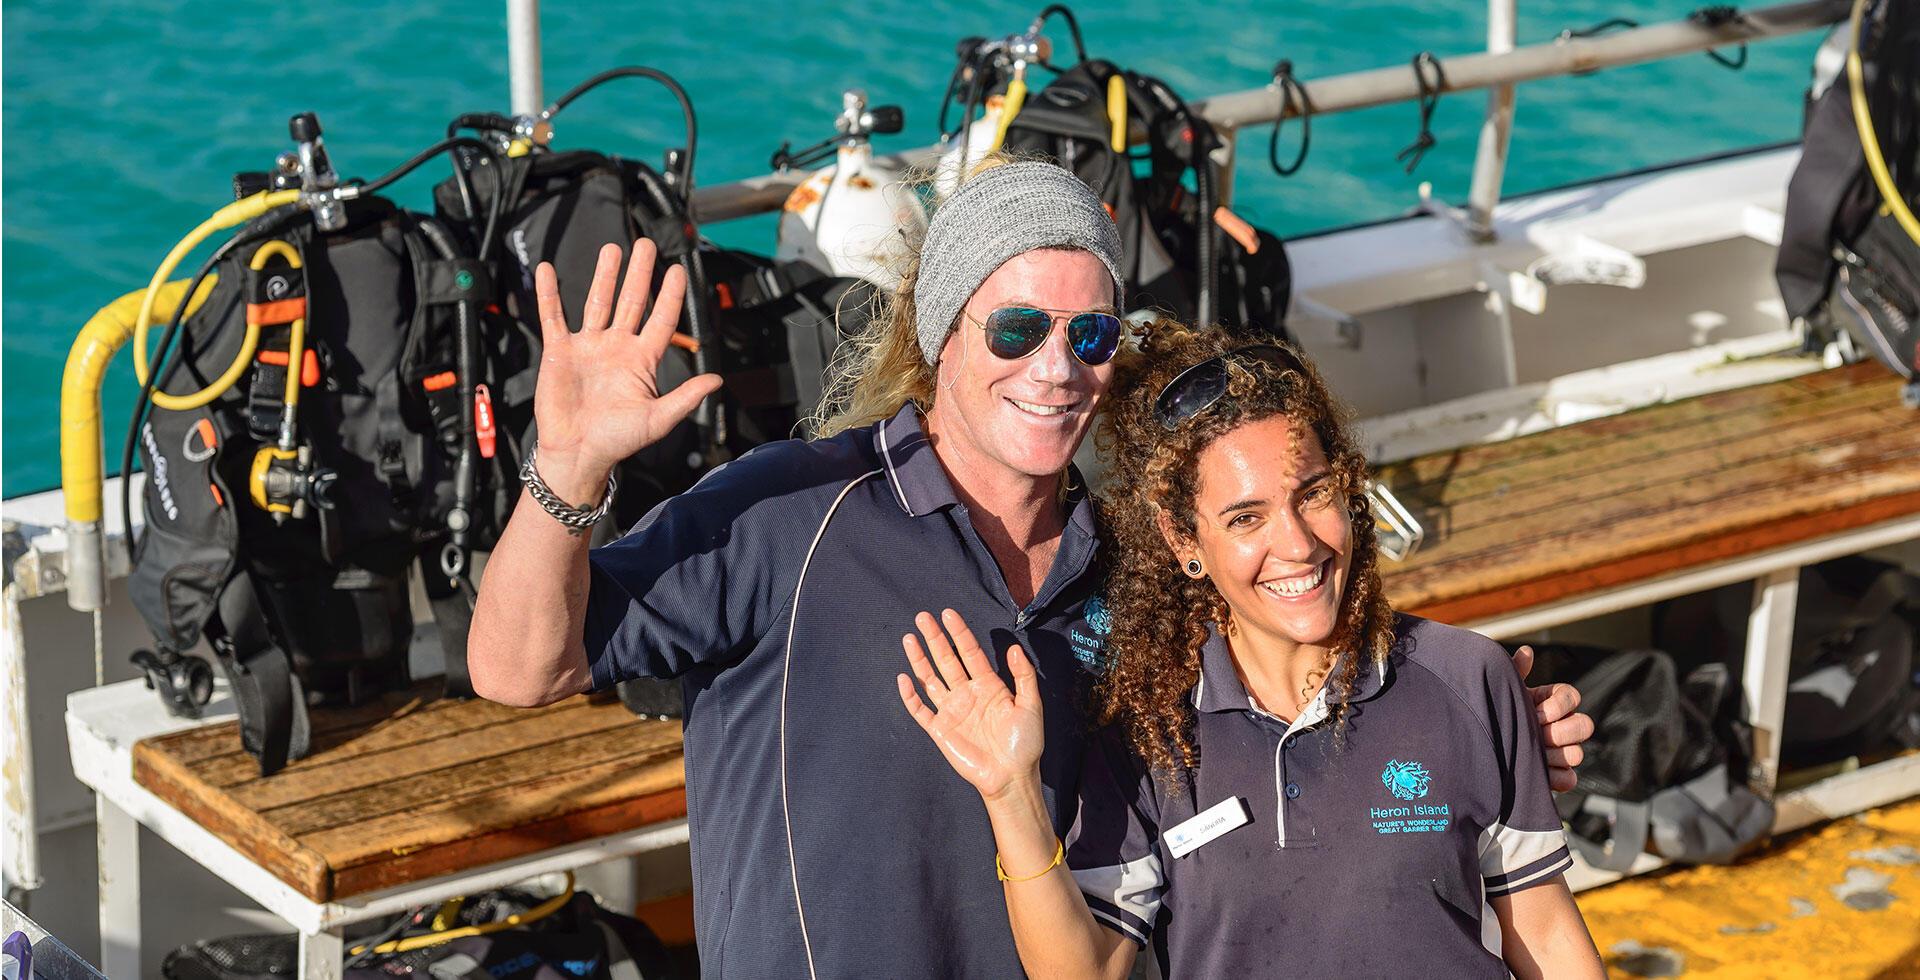 Dive Boat - Heron Island